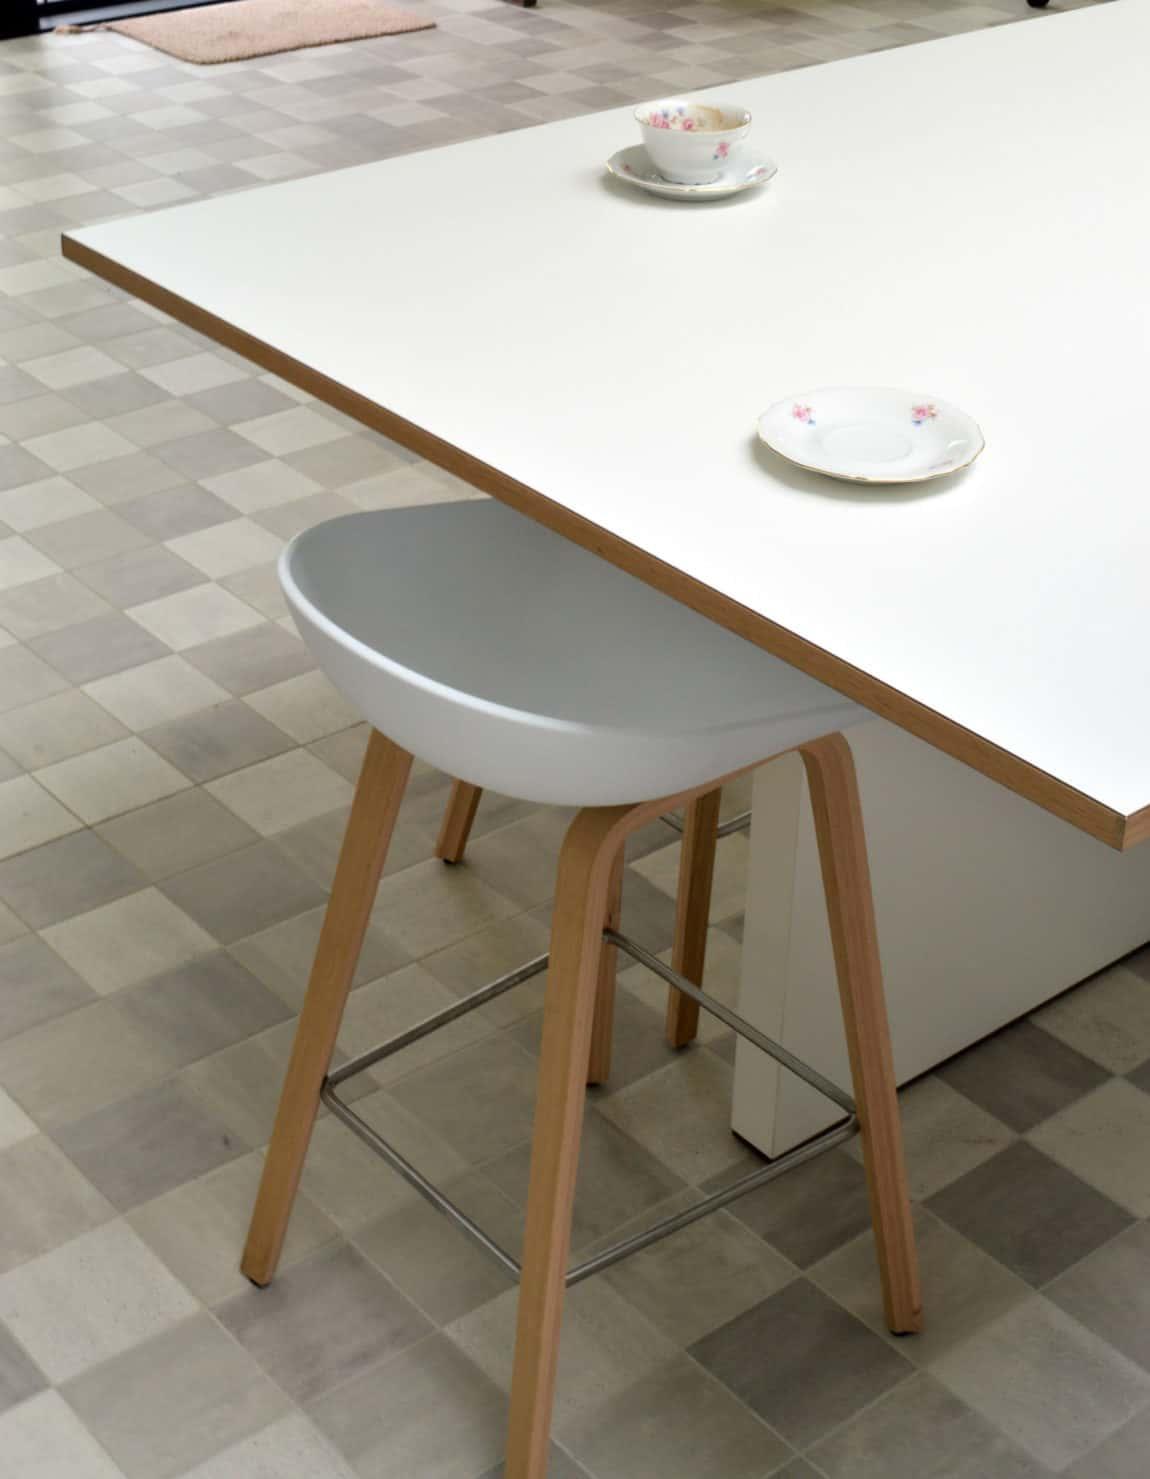 F&C Kiekens by Architektuurburo Dirk Hulpia (20)